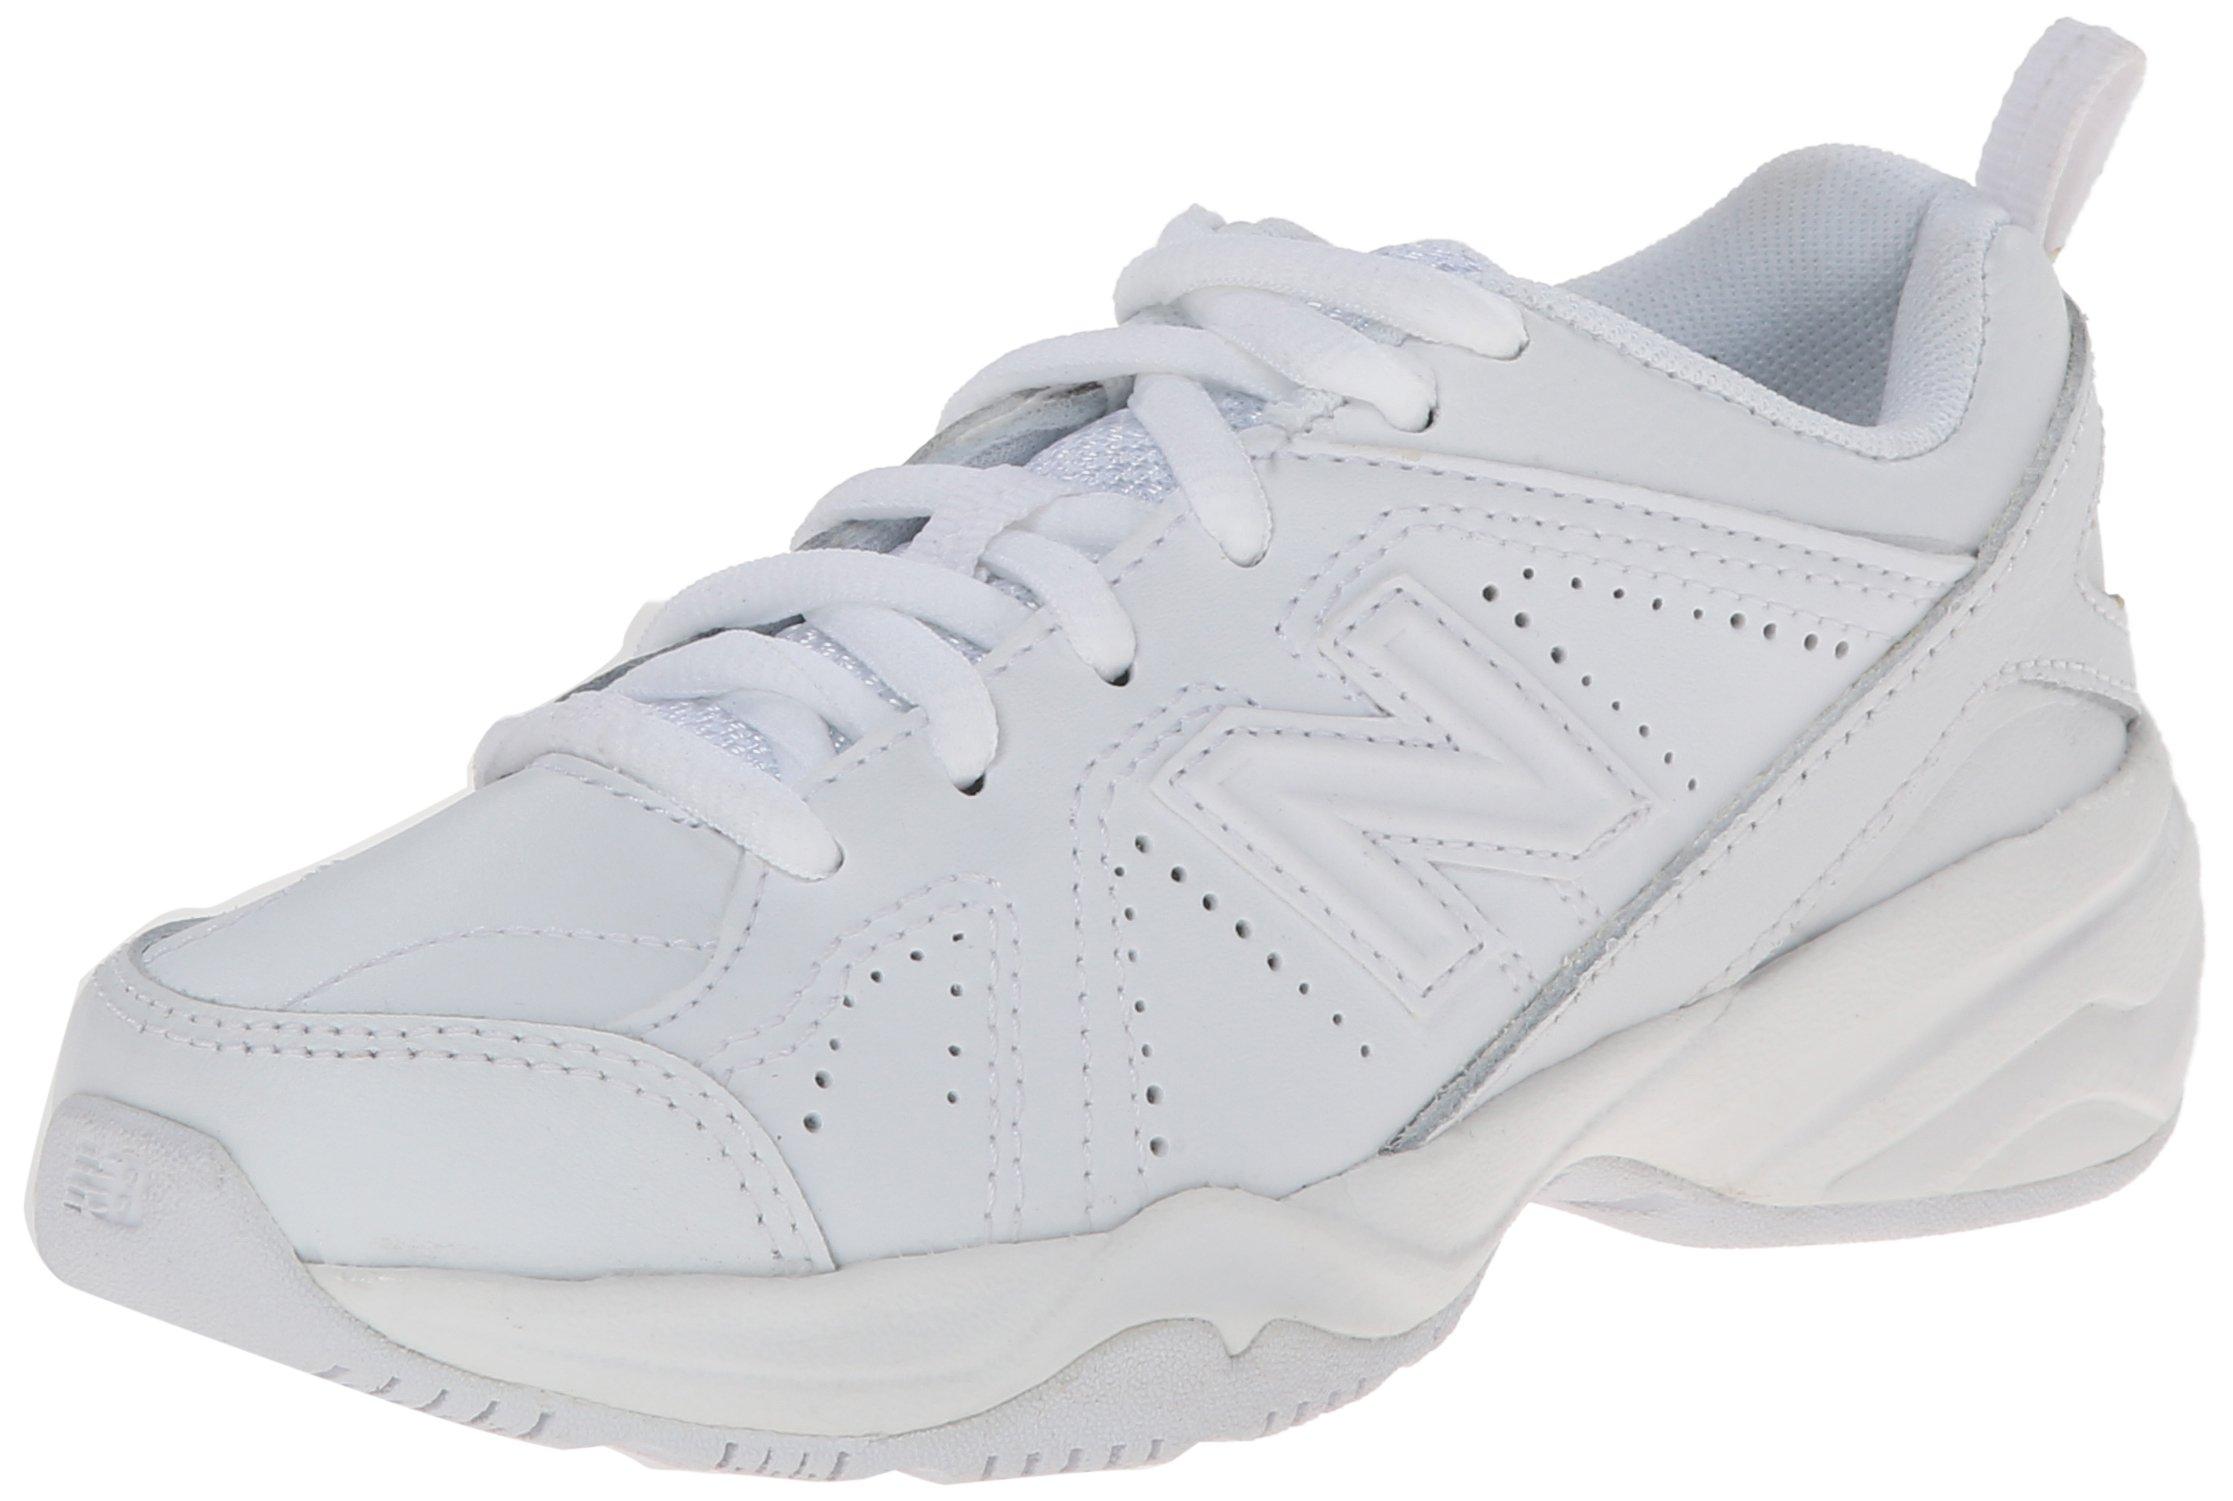 New Balance KX624 Lace-Up Training Shoe (Little Kid/Big Kid),White,2 M US Little Kid